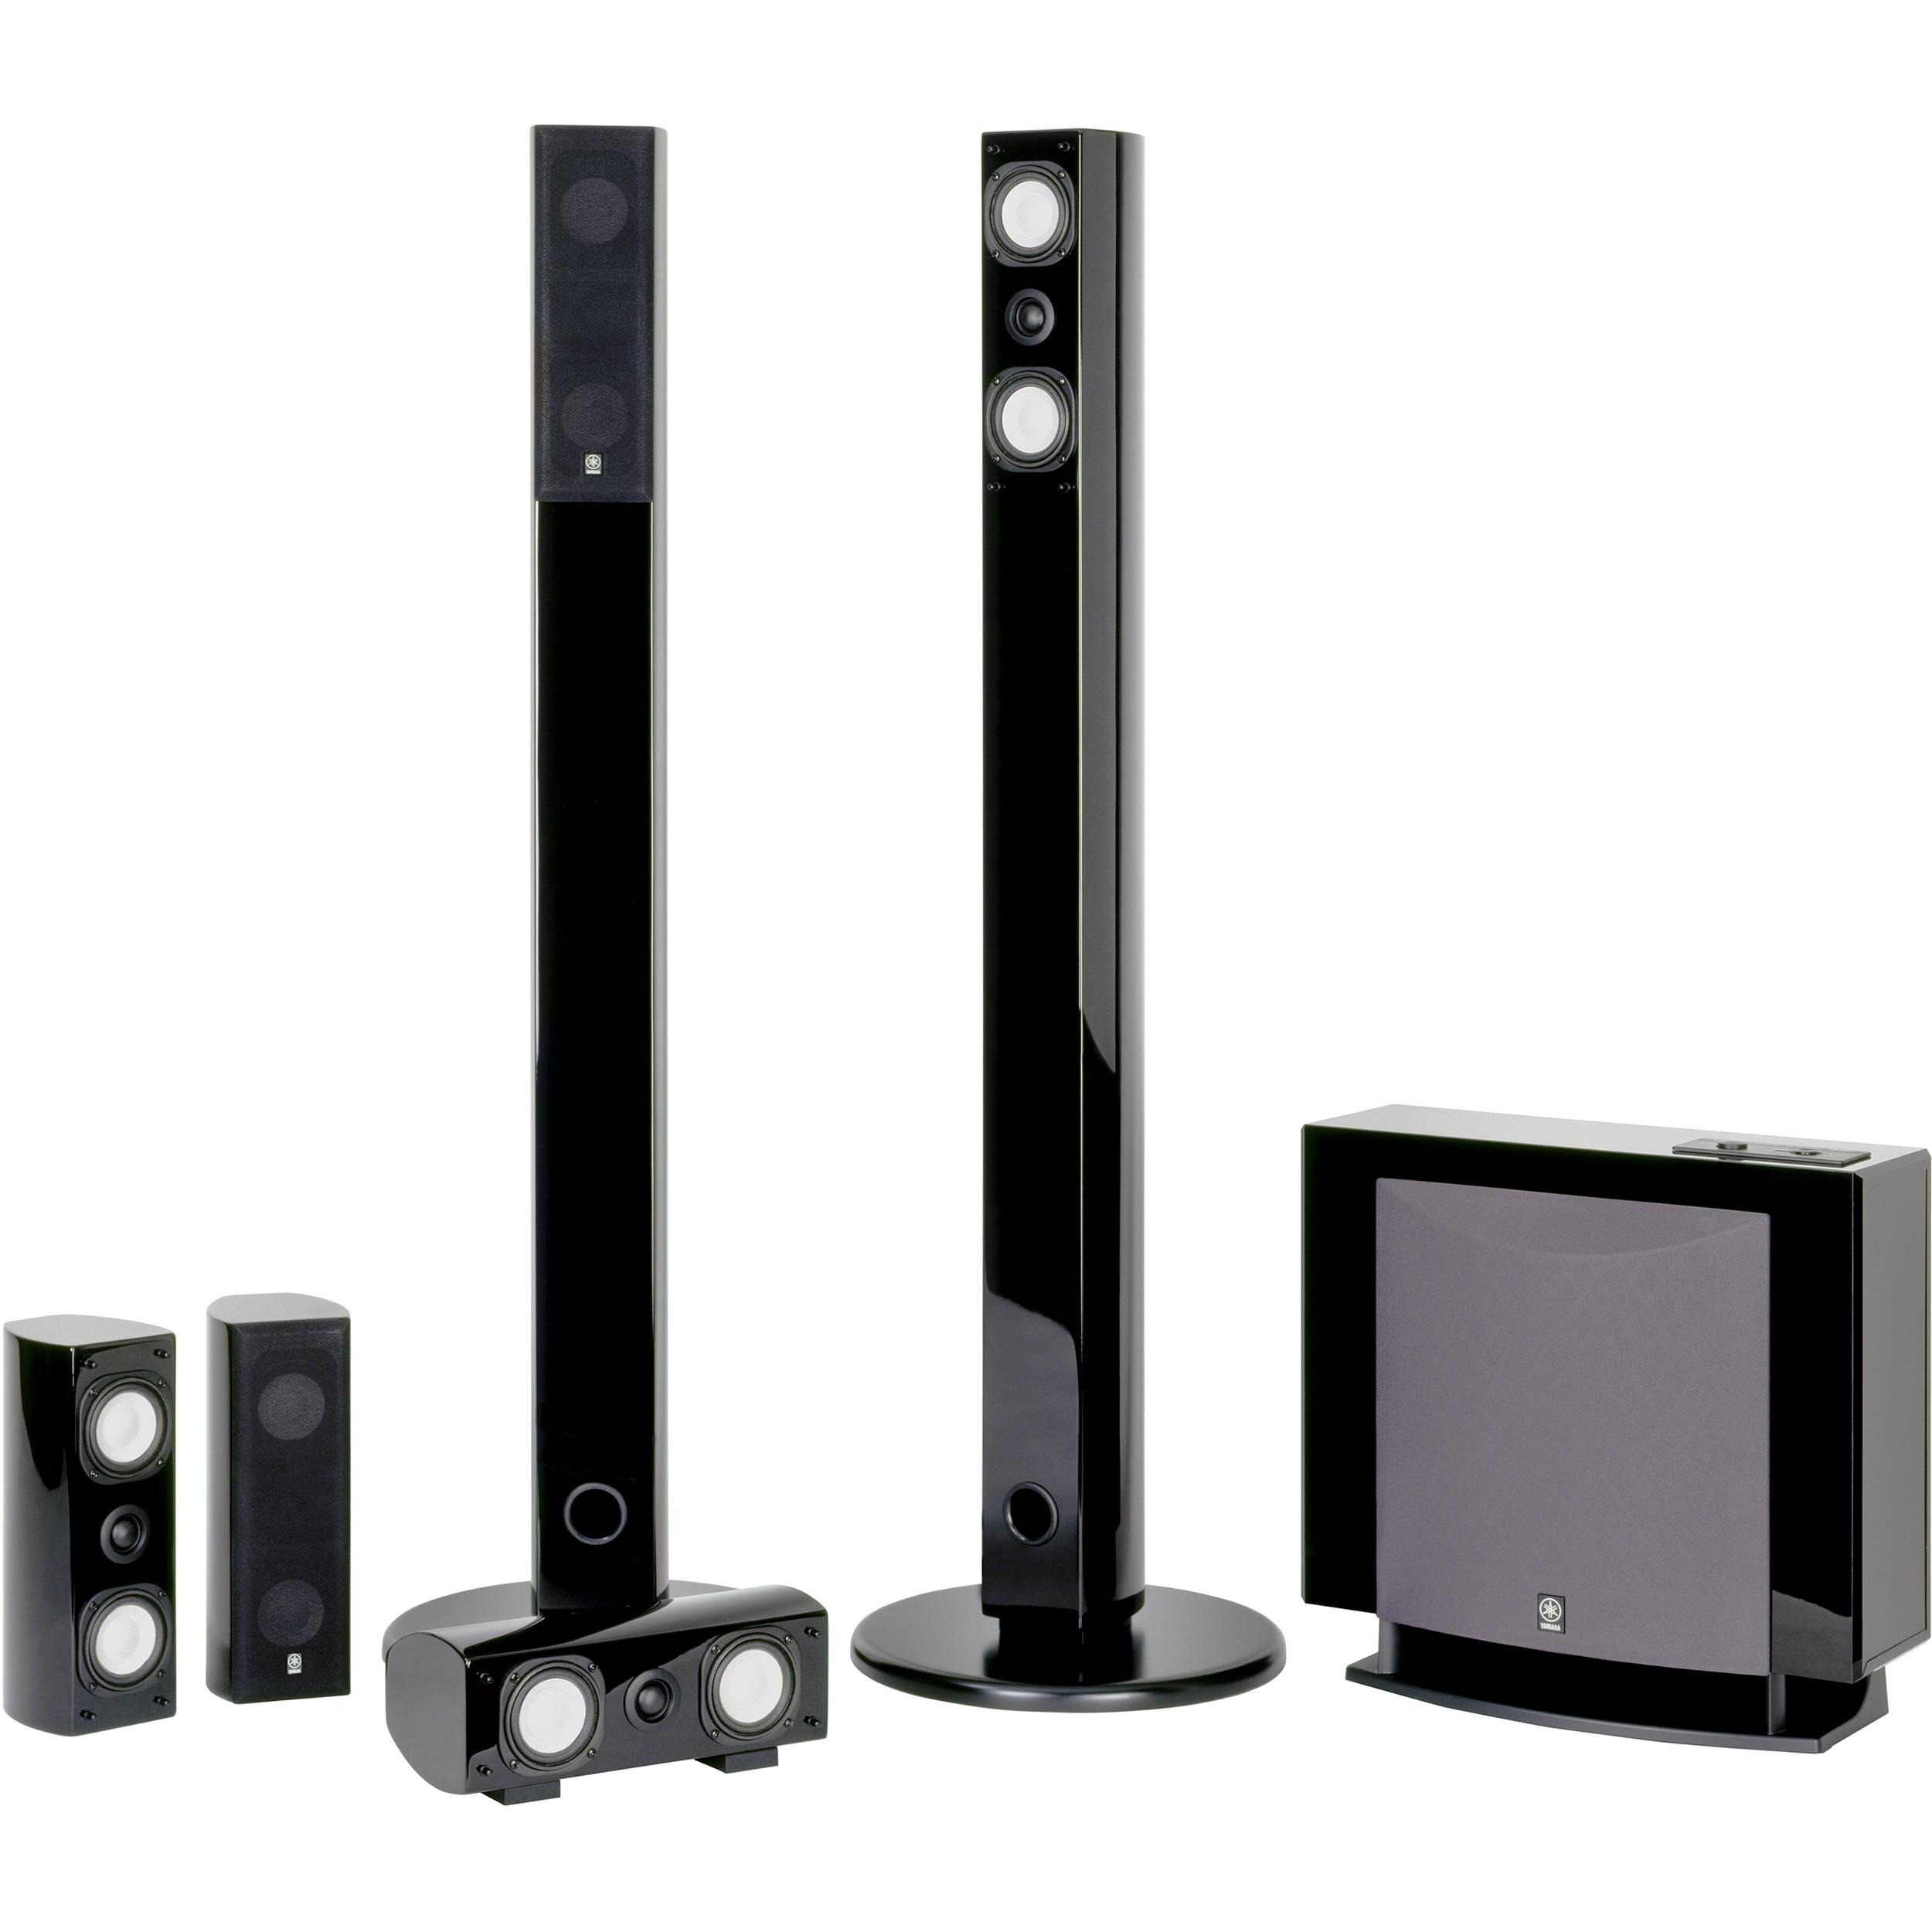 yamaha ns sp7800pn 5 1 channel home theater speaker ns. Black Bedroom Furniture Sets. Home Design Ideas